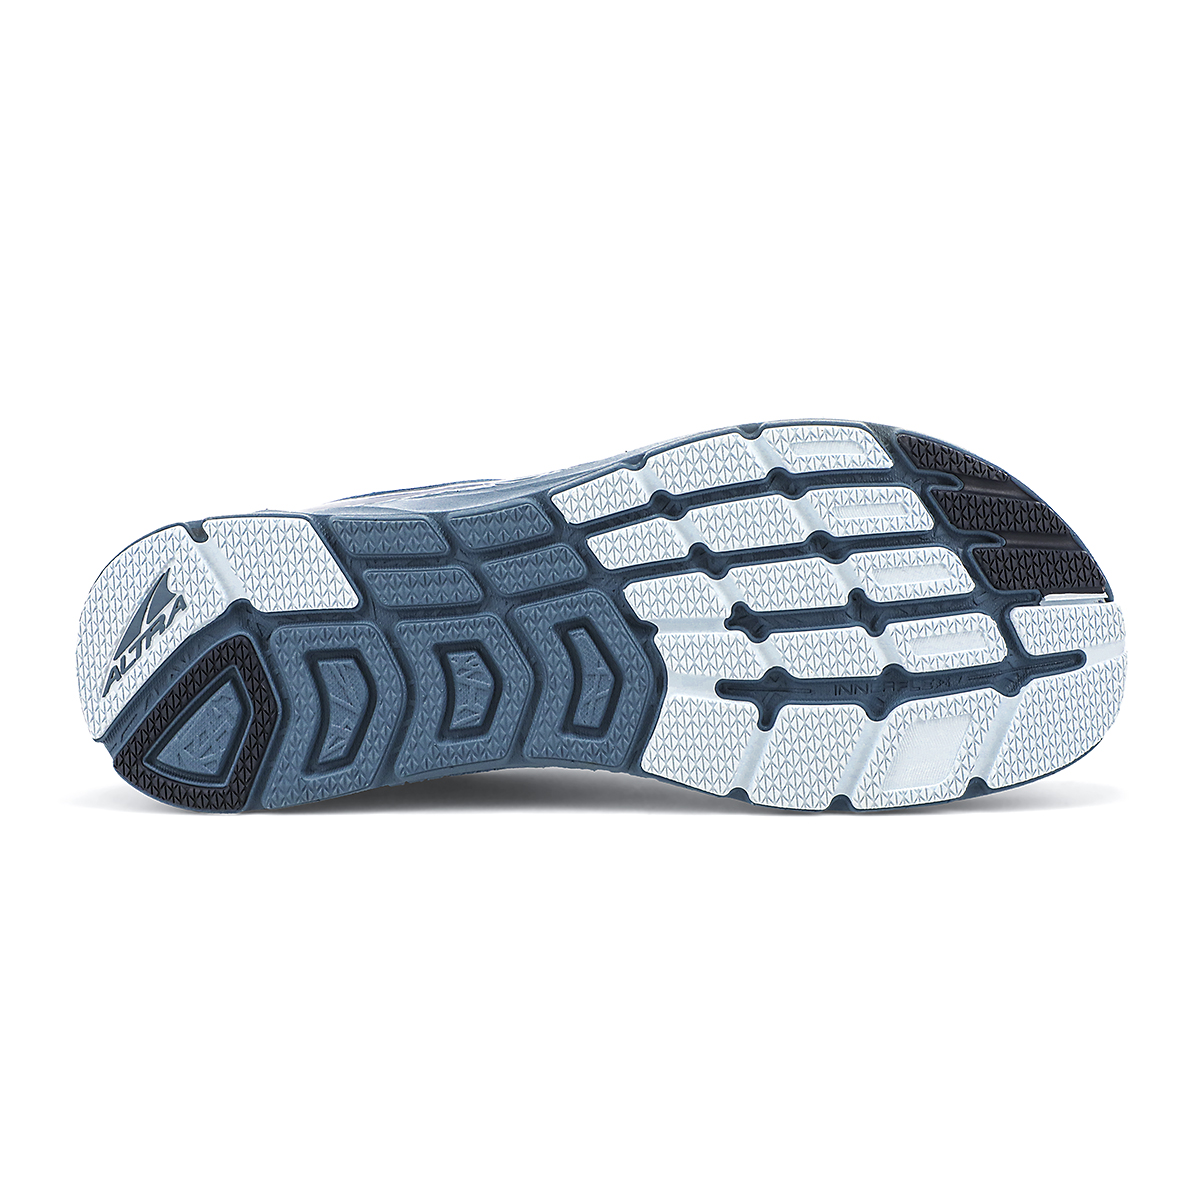 Men's Altra Rivera Running Shoe - Color: Majolica Blue - Size: 7 - Width: Regular, Majolica Blue, large, image 4